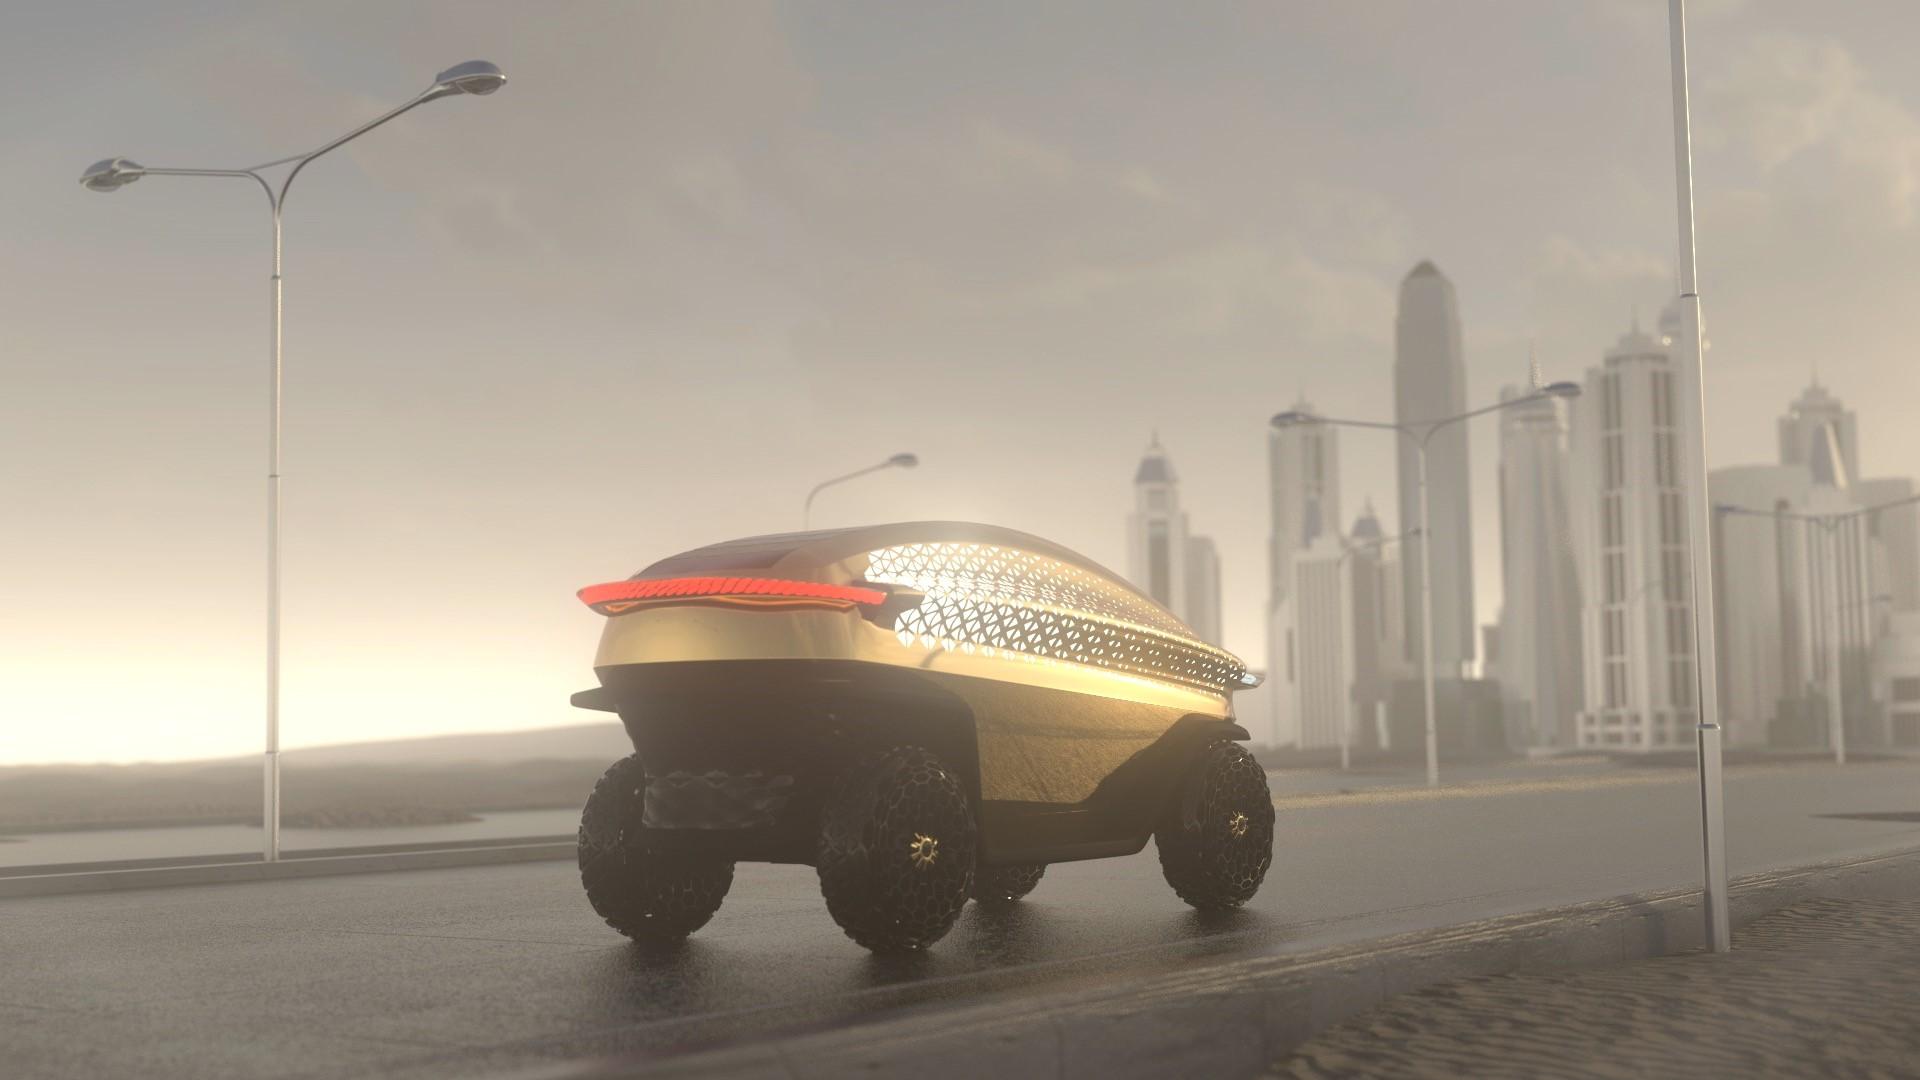 Digital render of a customized LOCI vehicle. Image via BigRep.